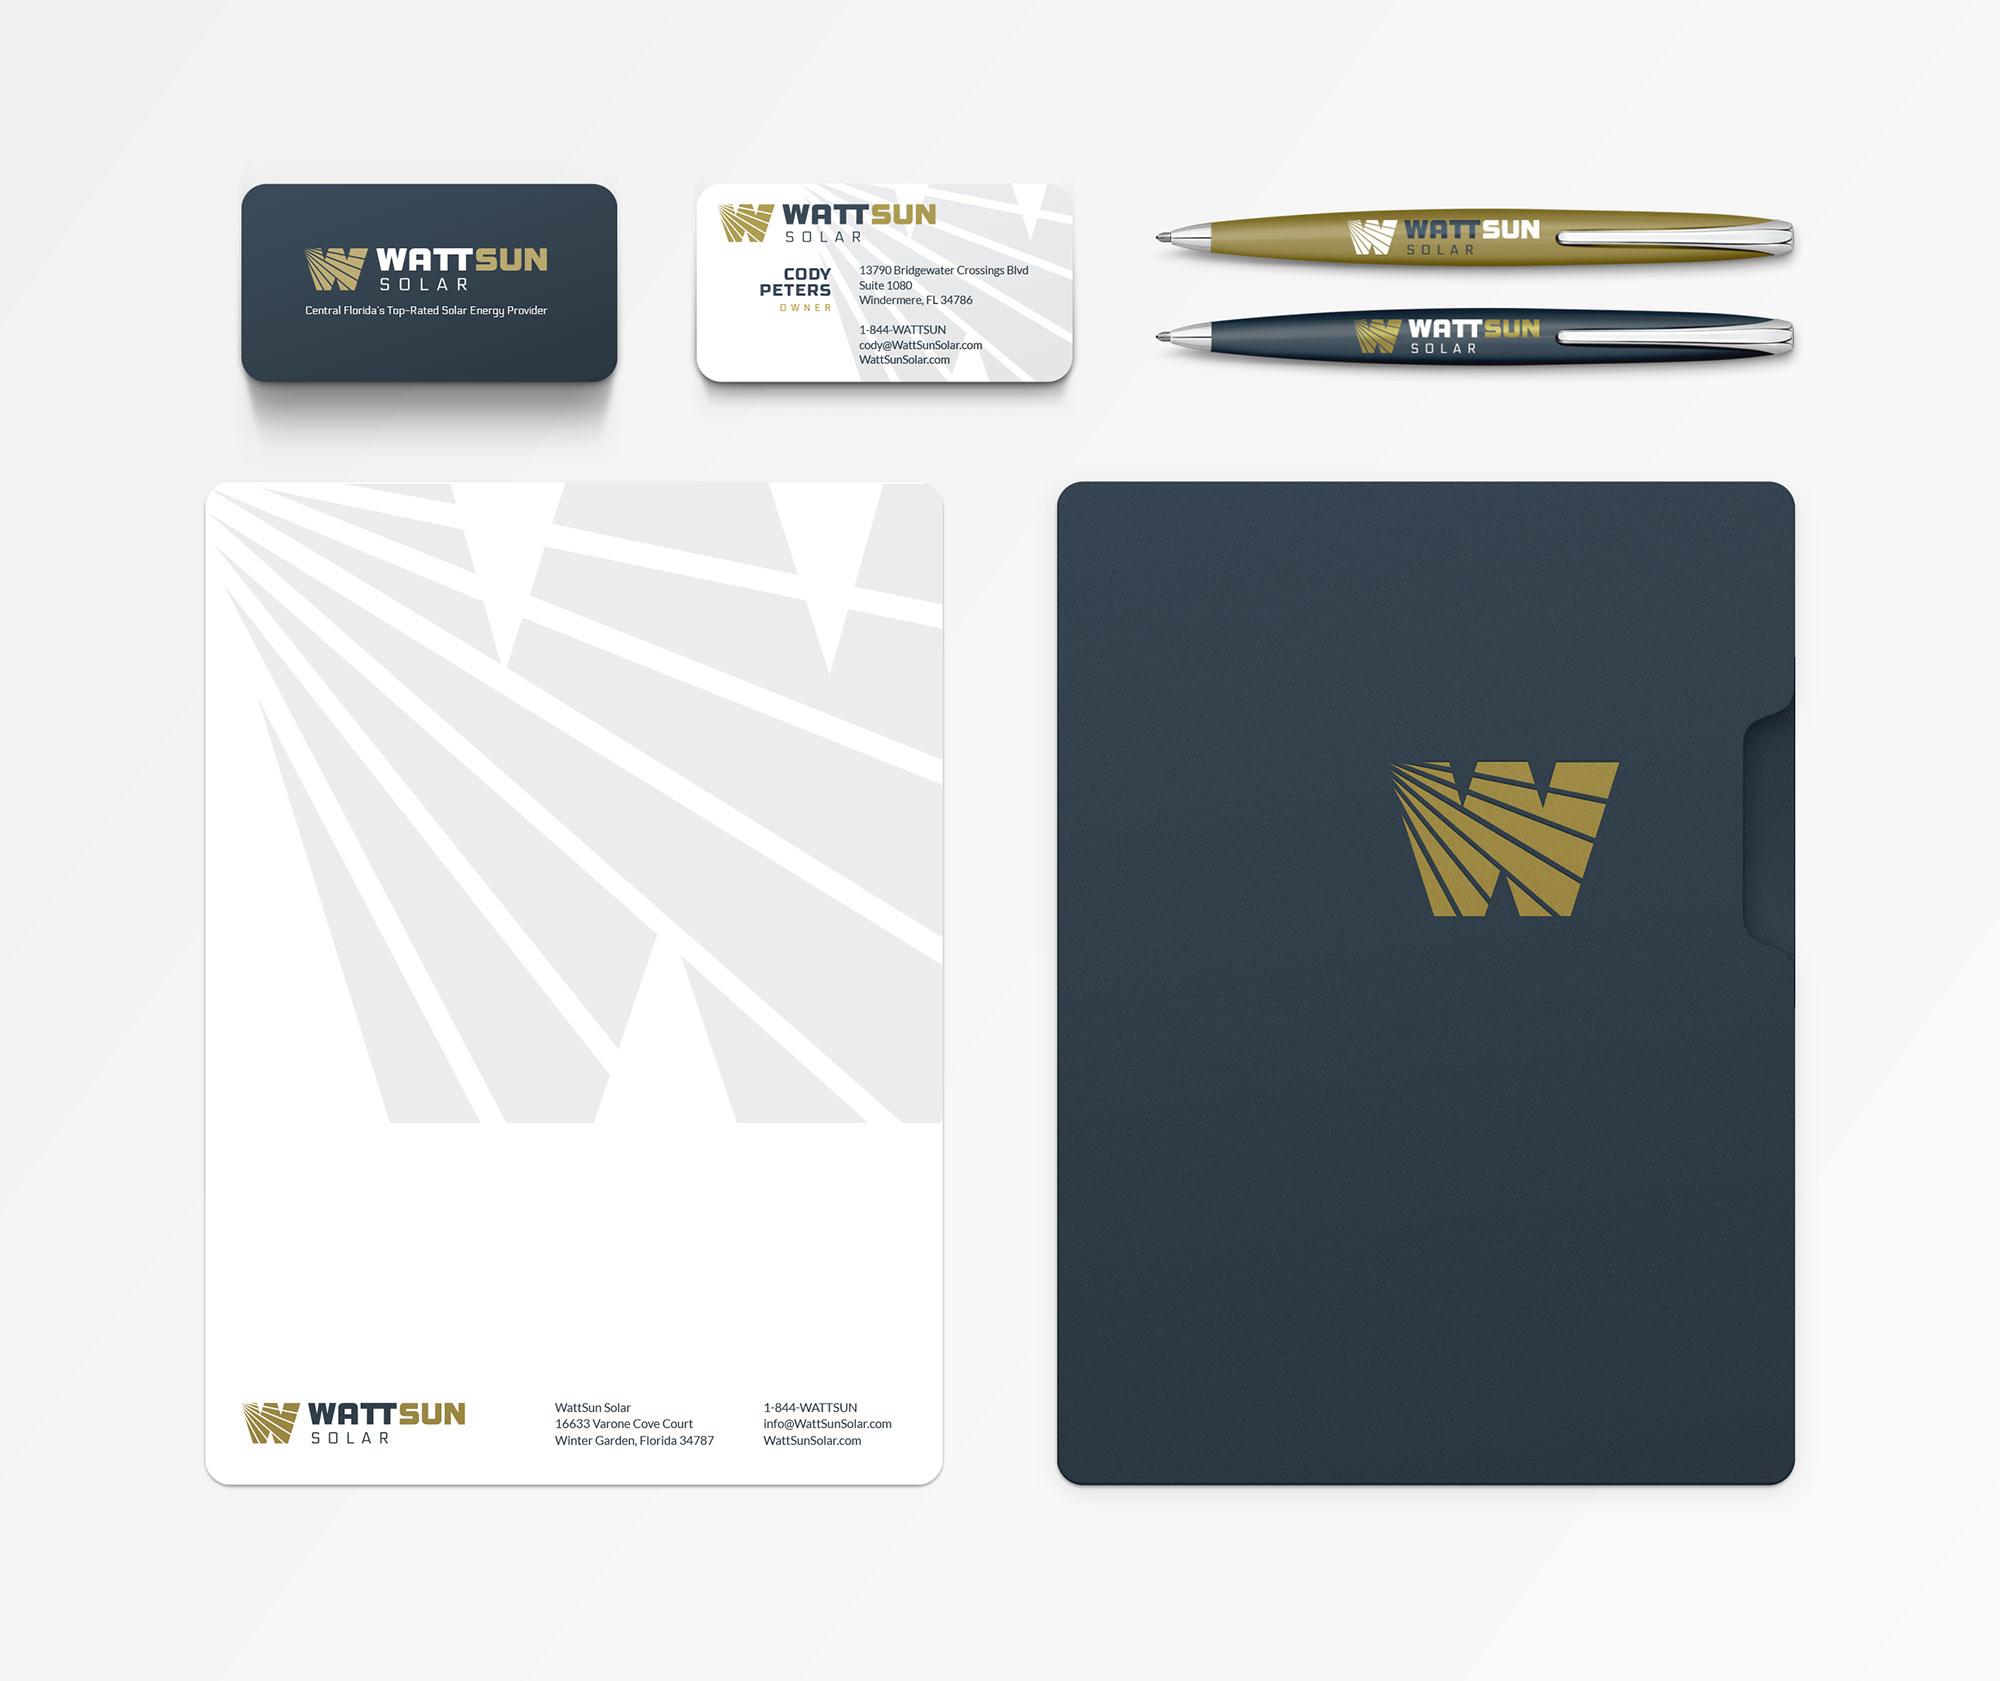 WattSun identity design